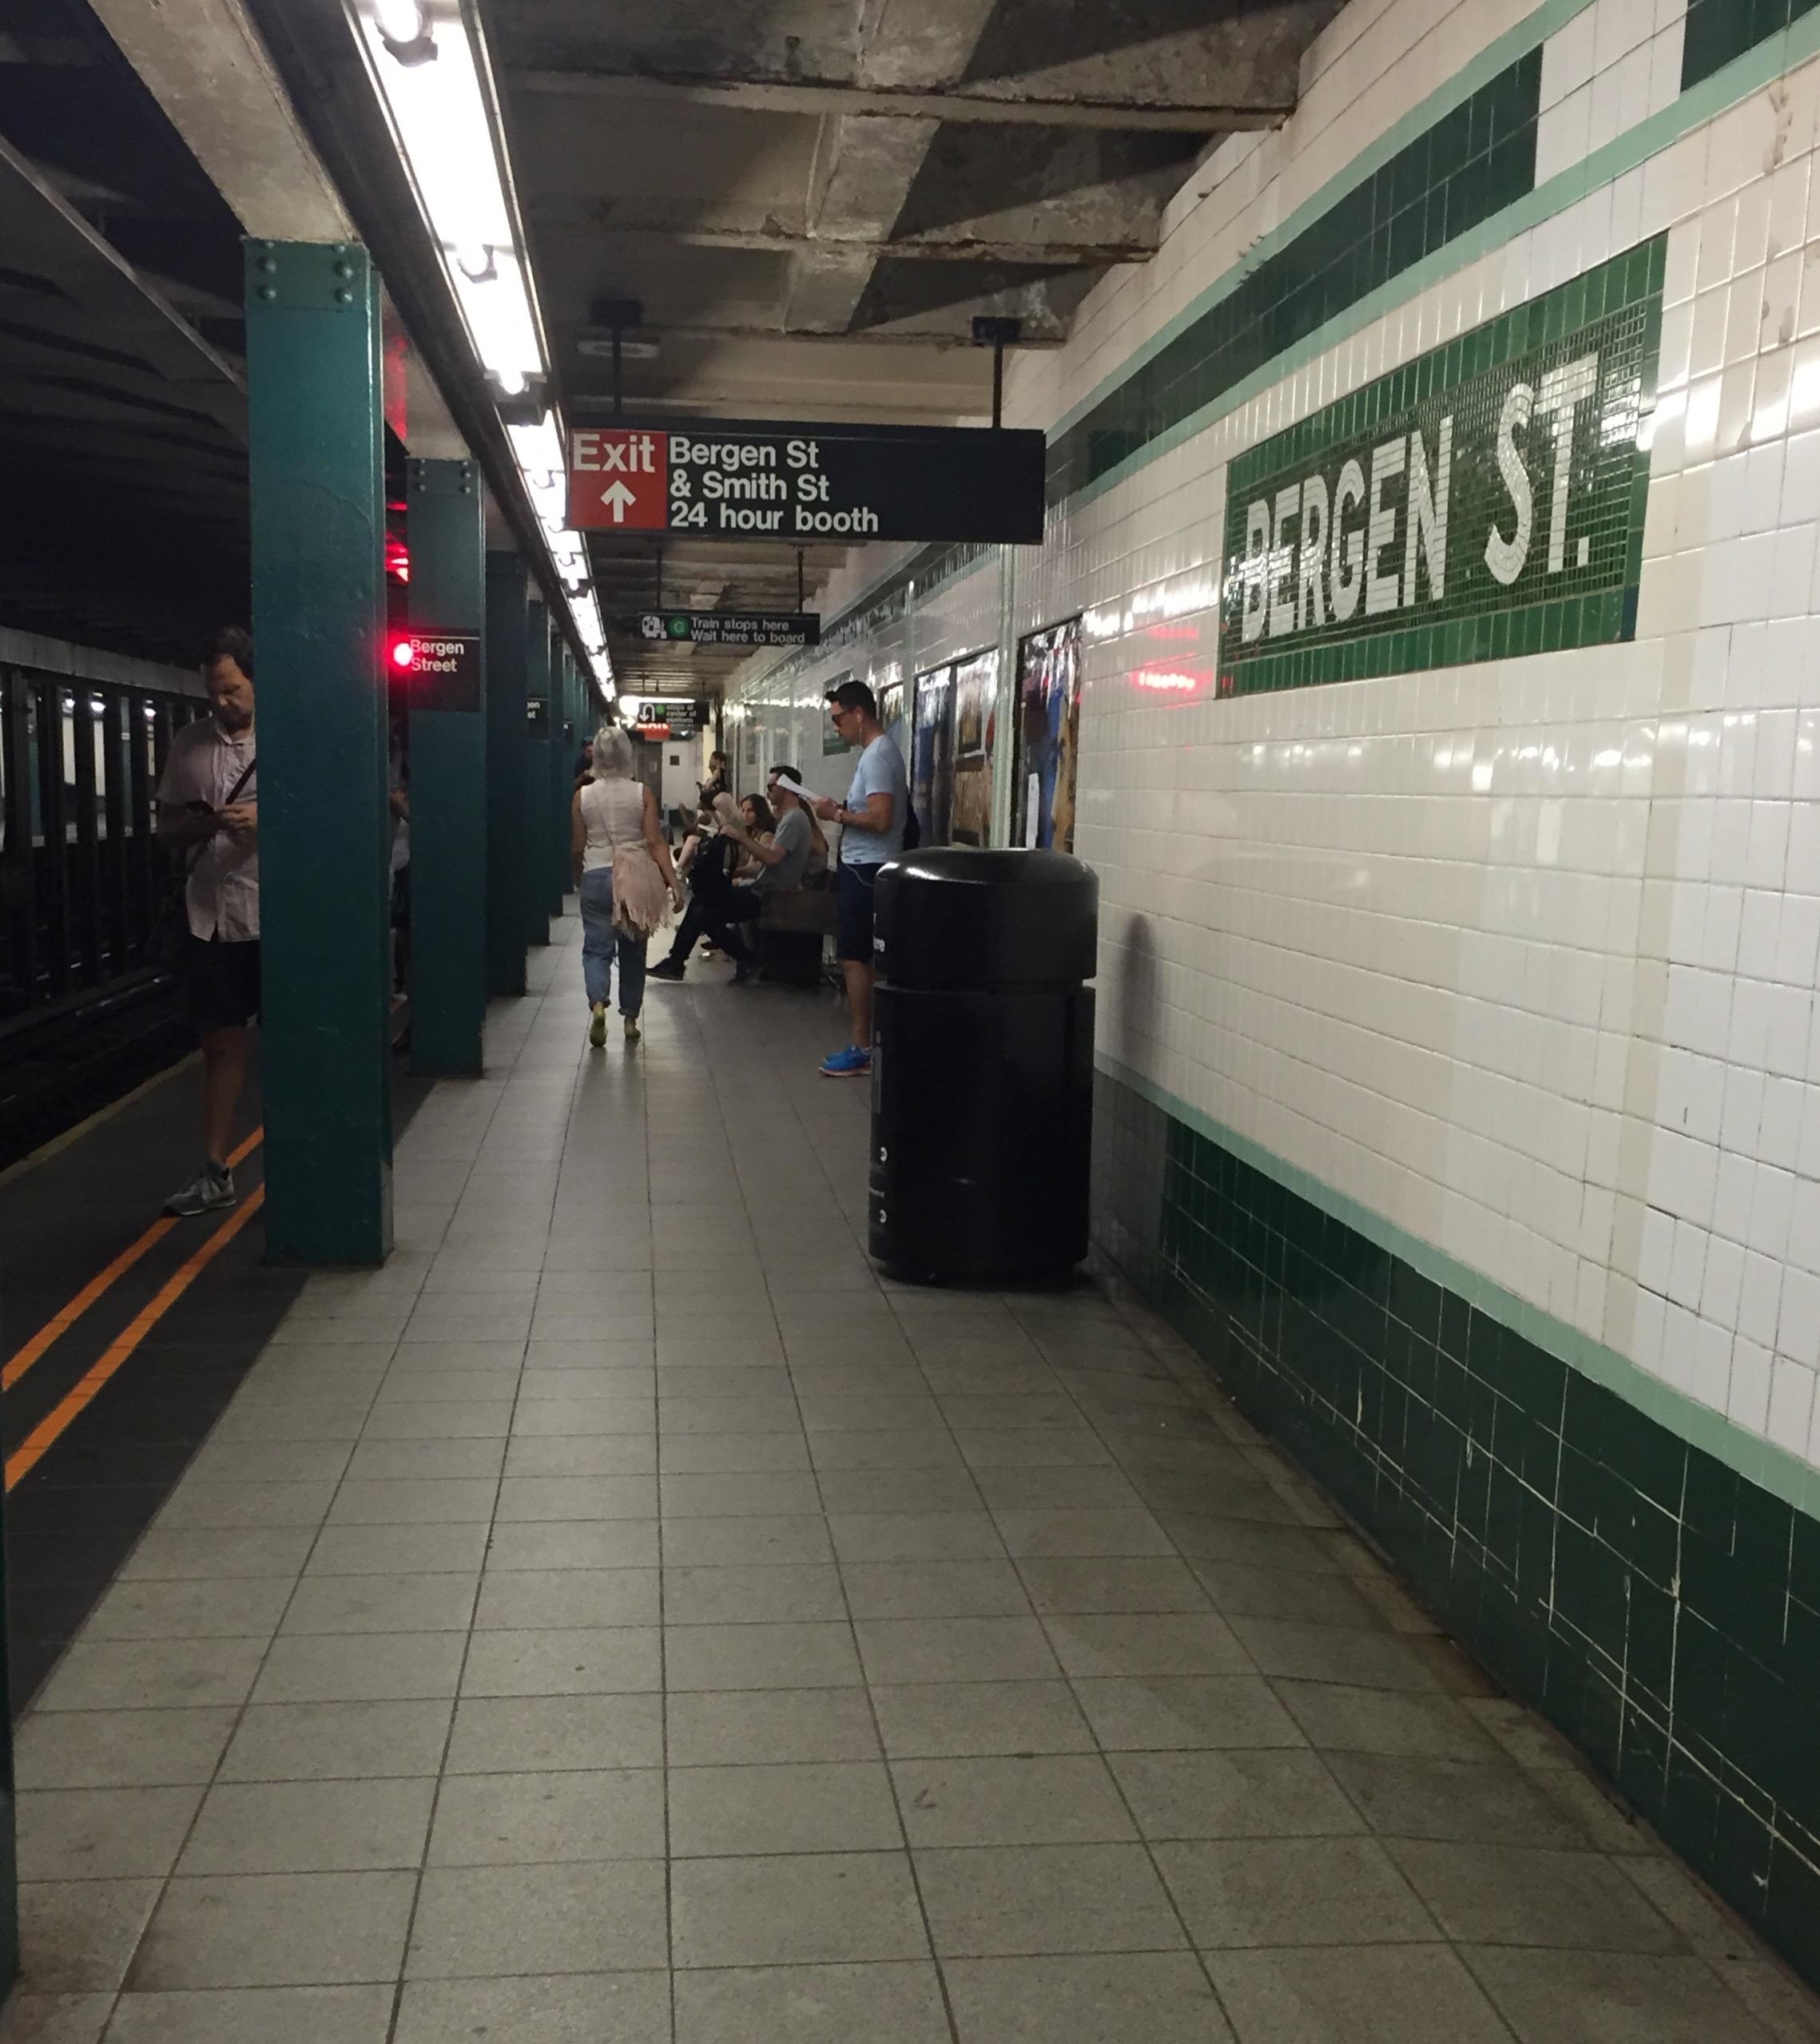 bergen street station ind culver line